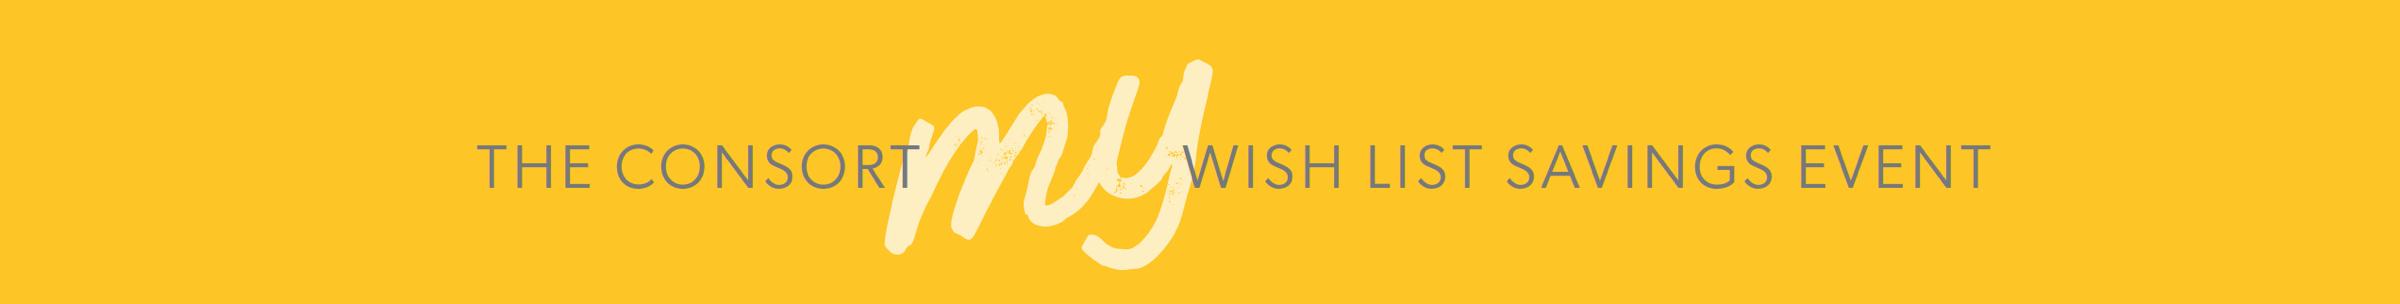 My Wish List Savings Event